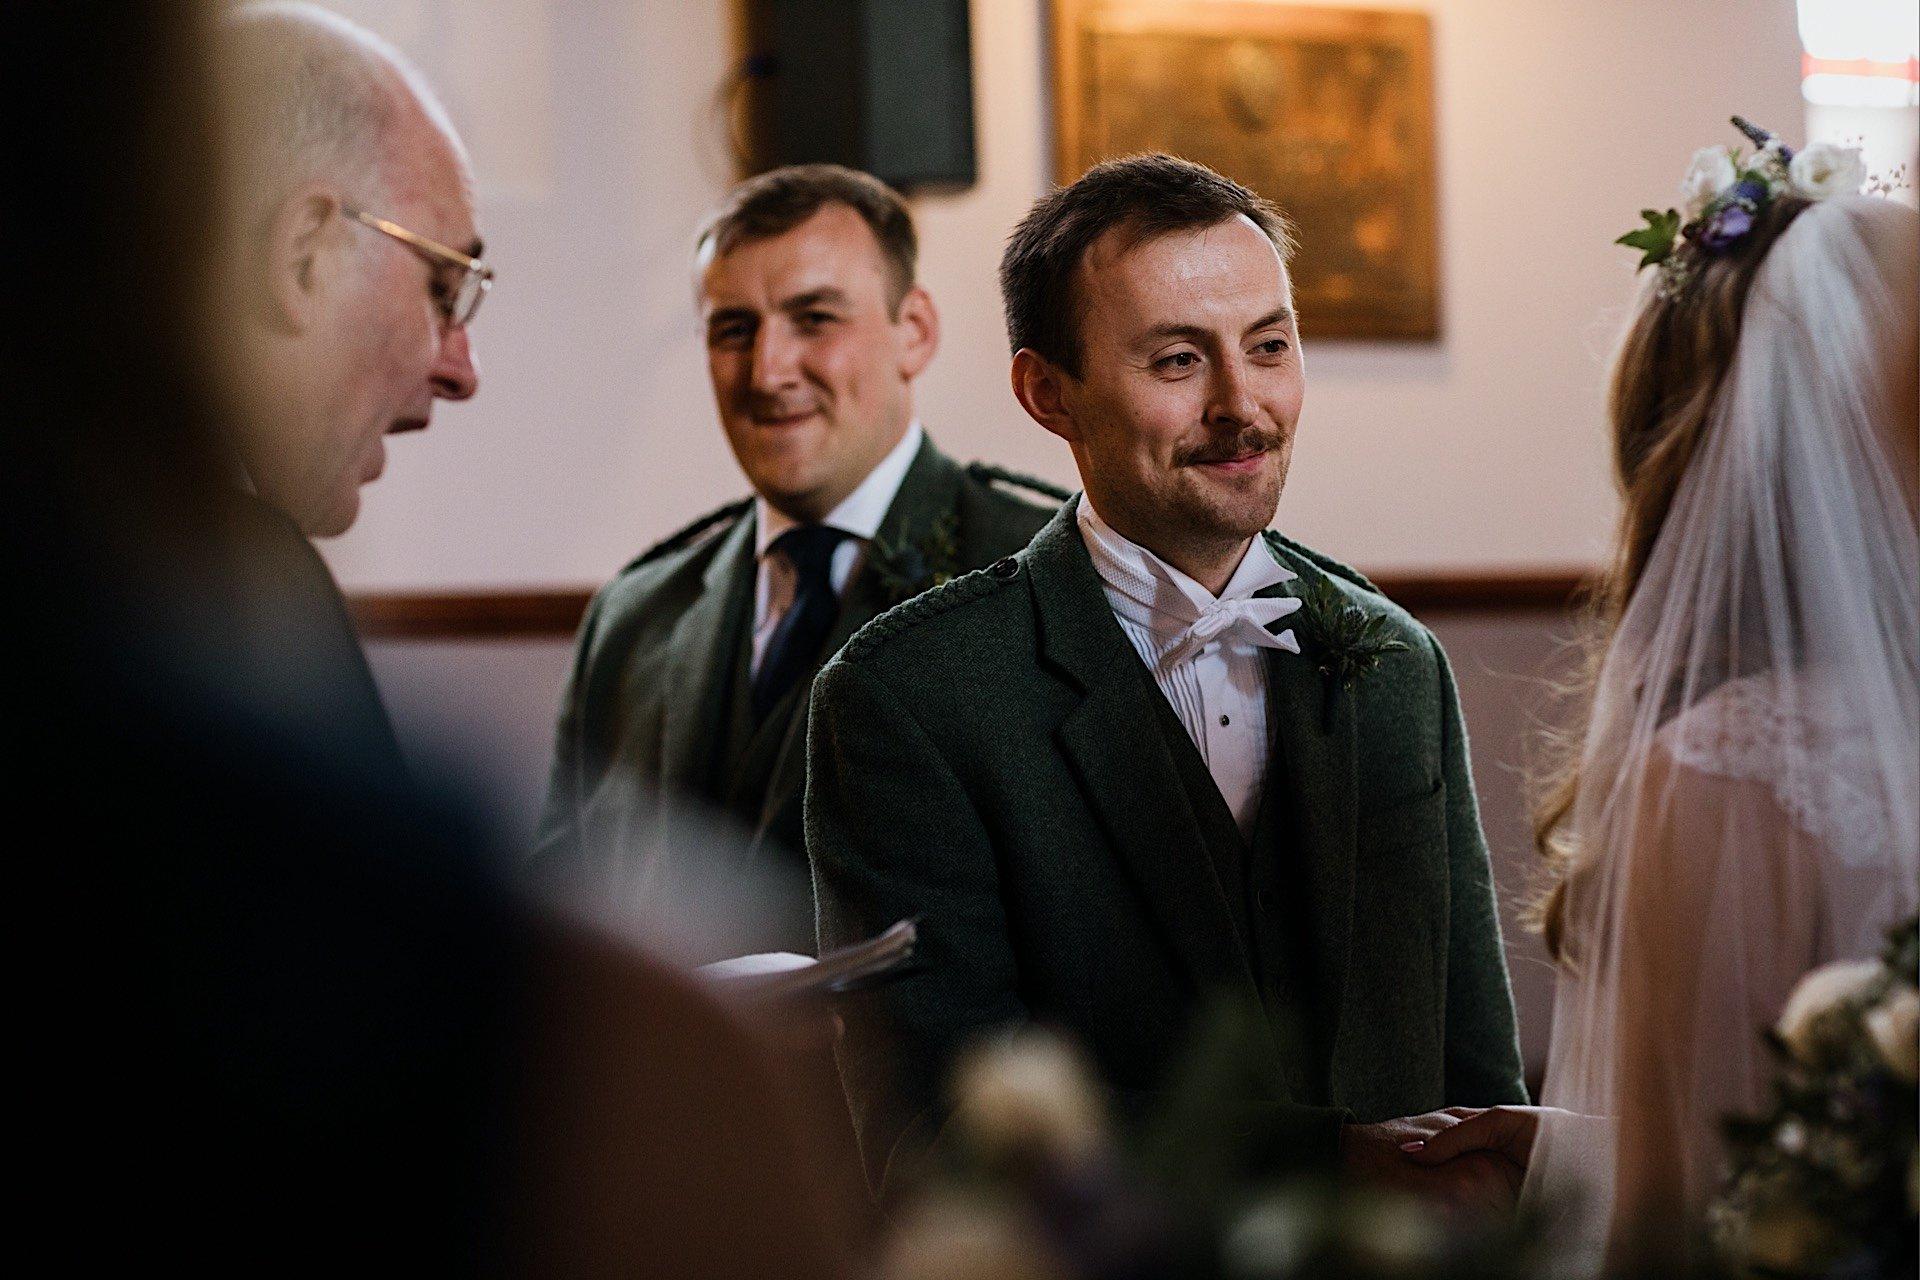 smiling bride in groom facing church